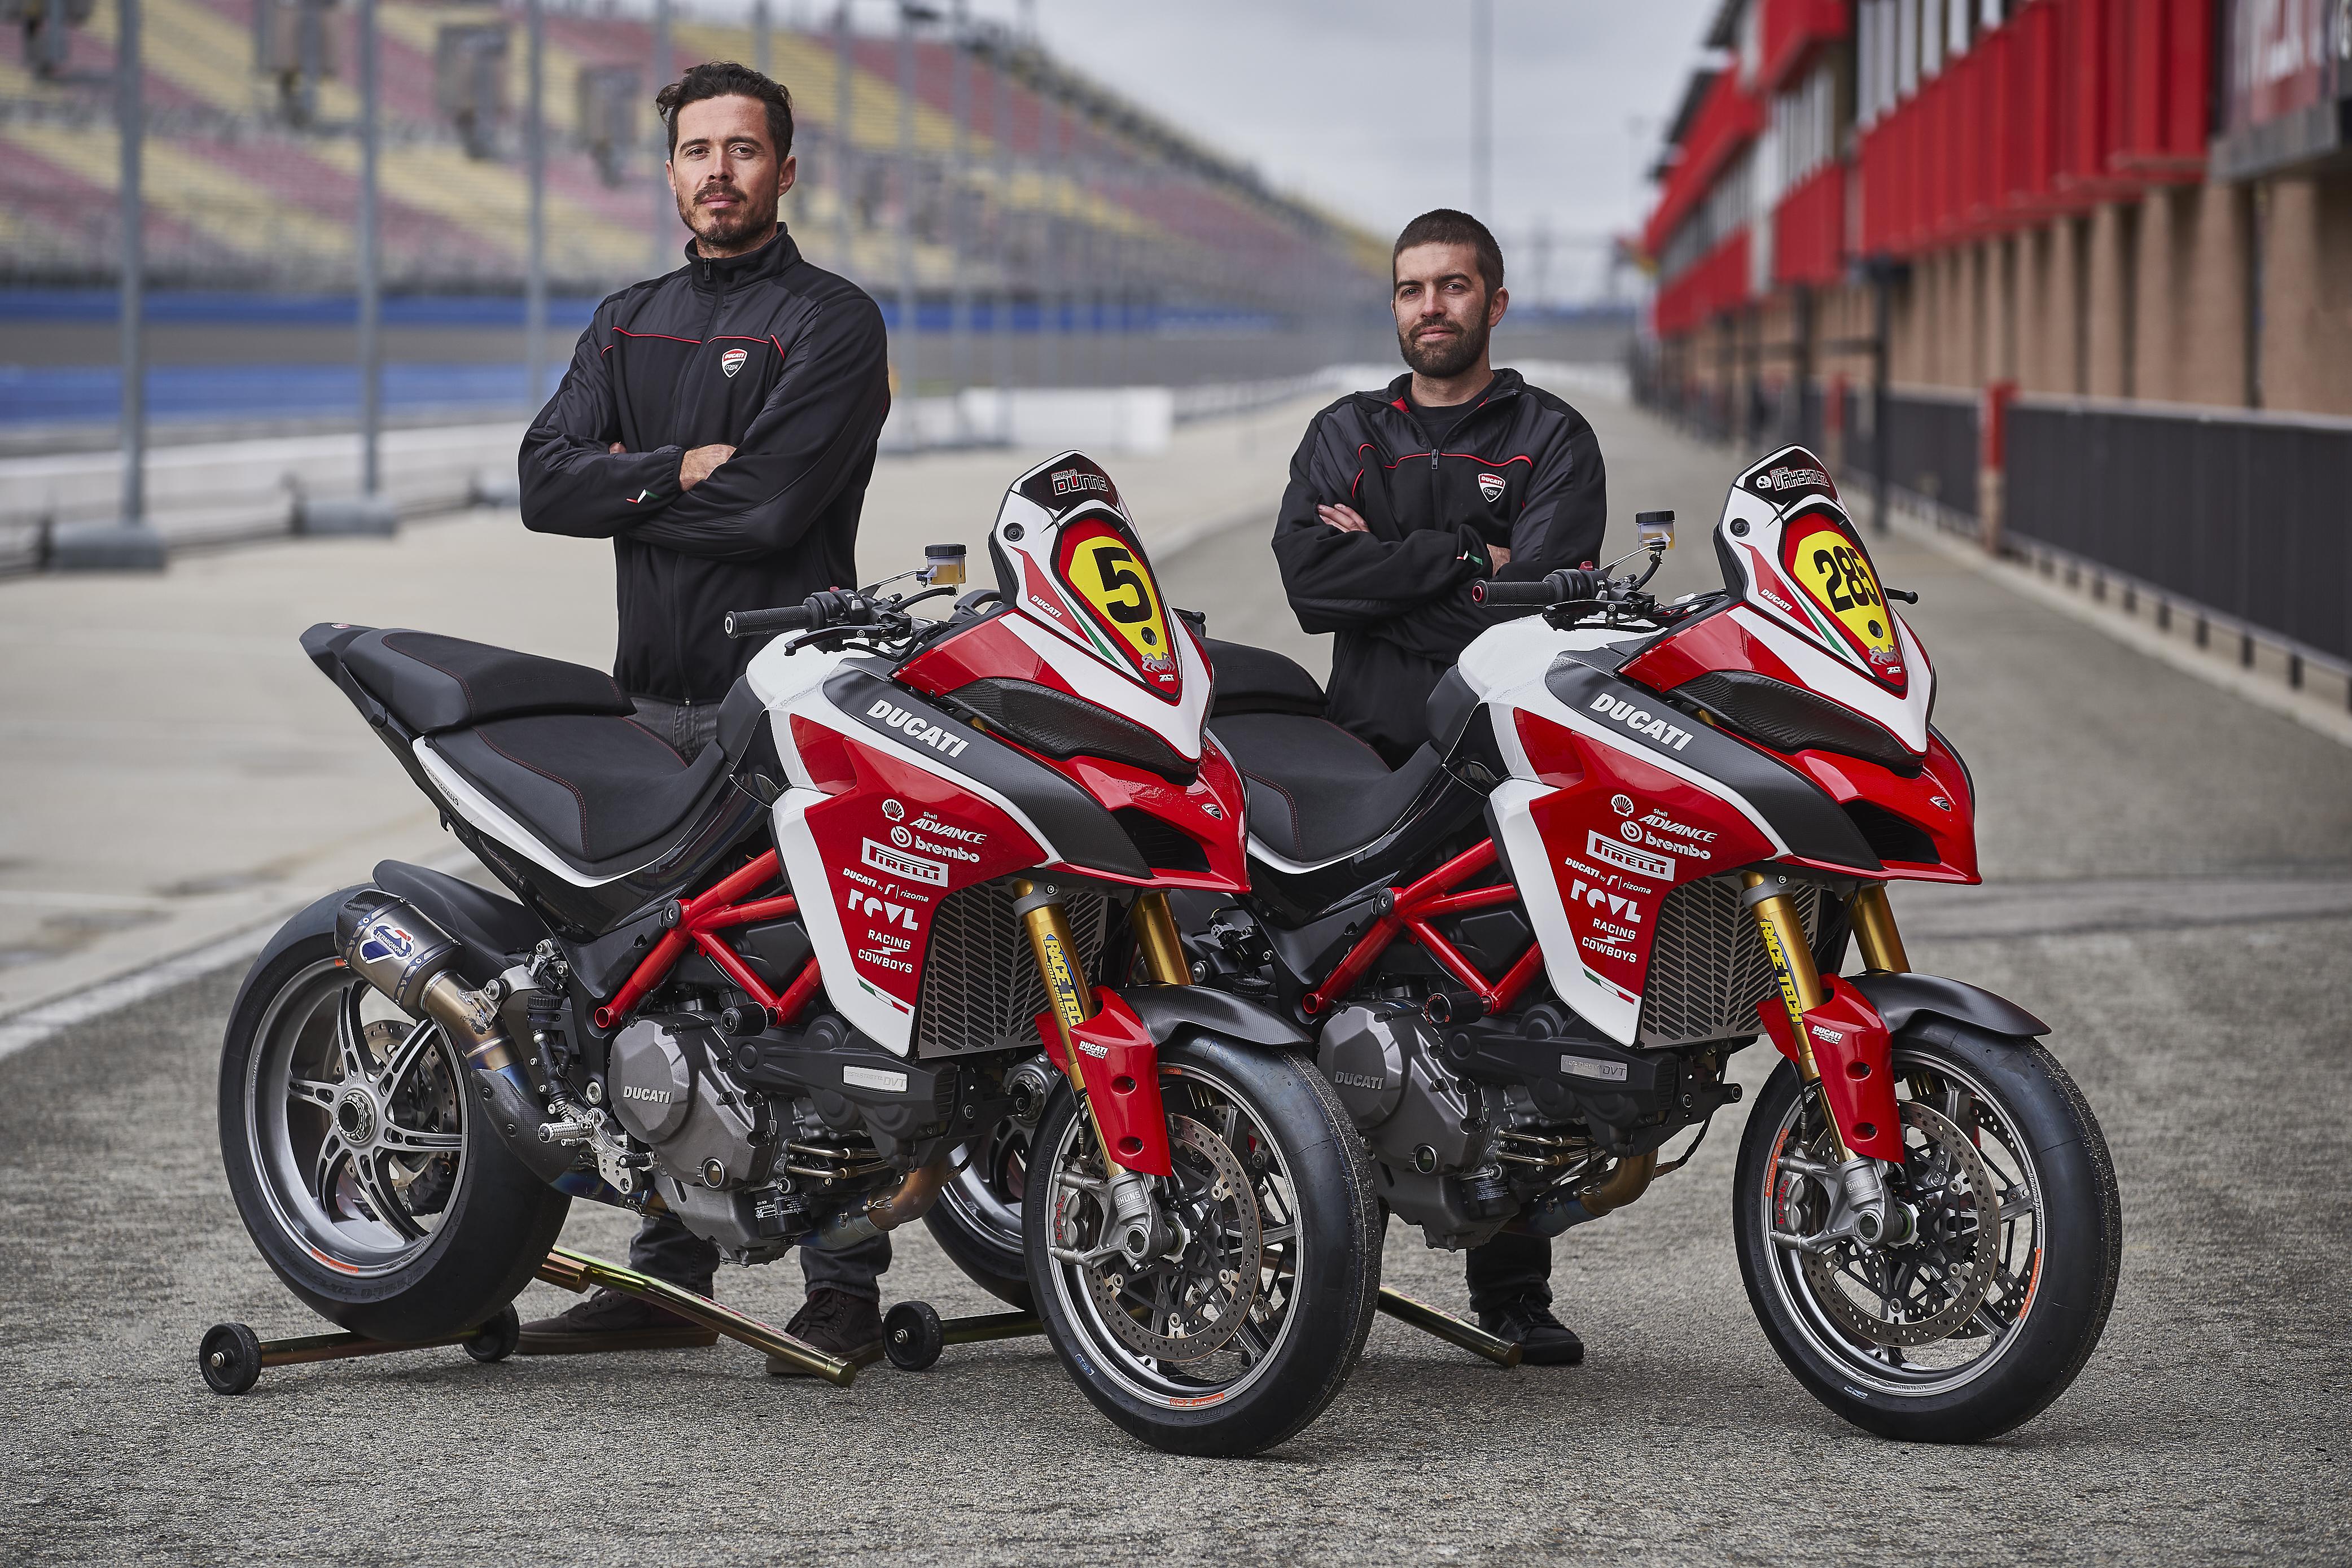 Spider Grips Ducati Pikes Peak Riders